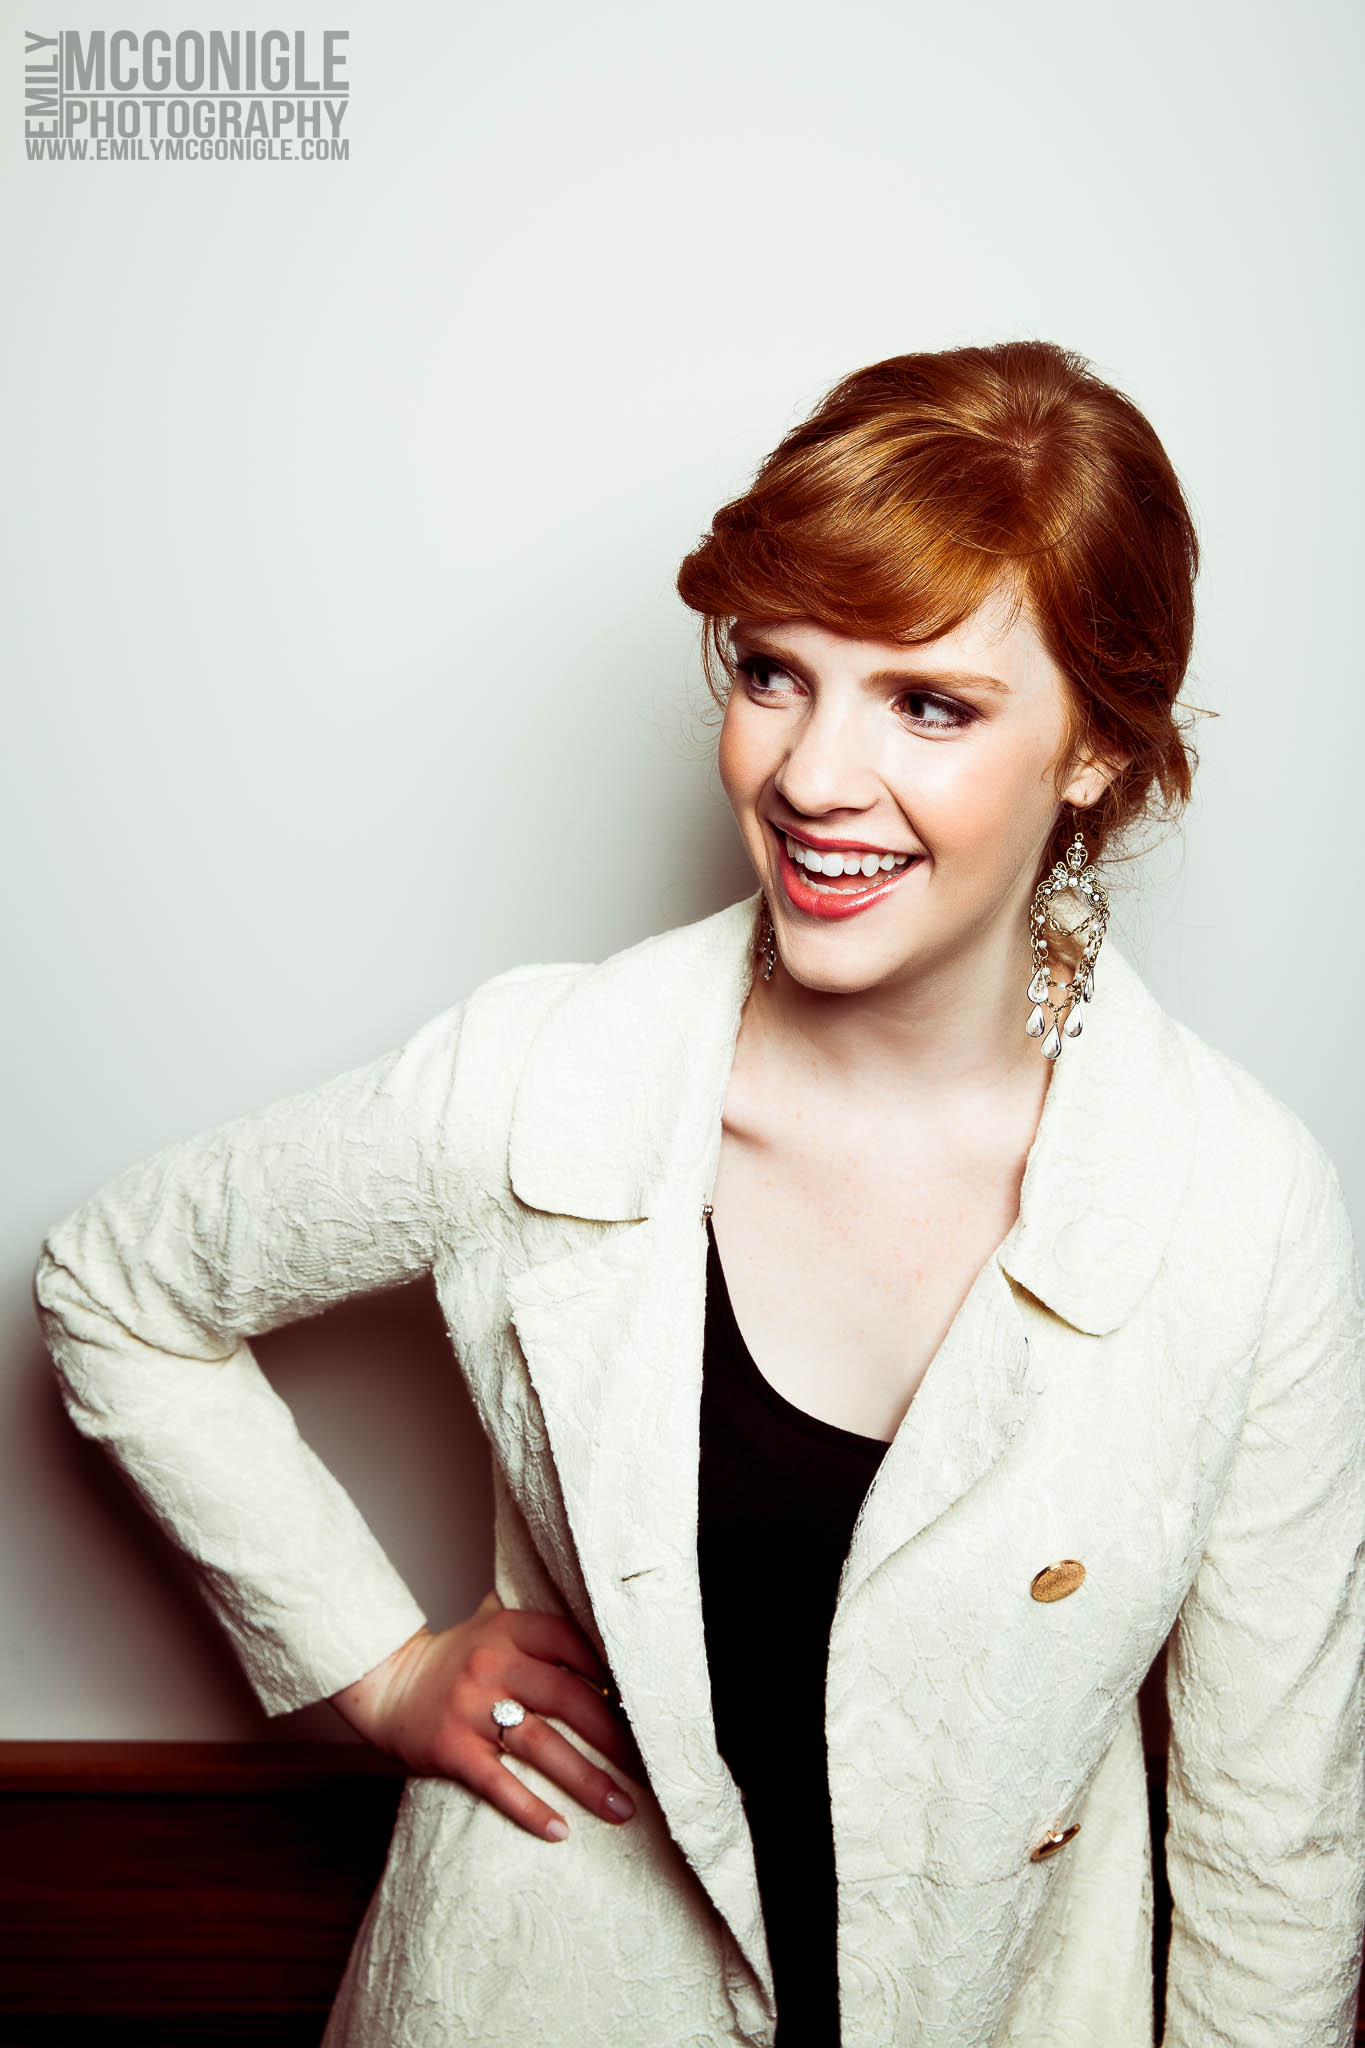 laughing-red-hair-white-wall.jpg